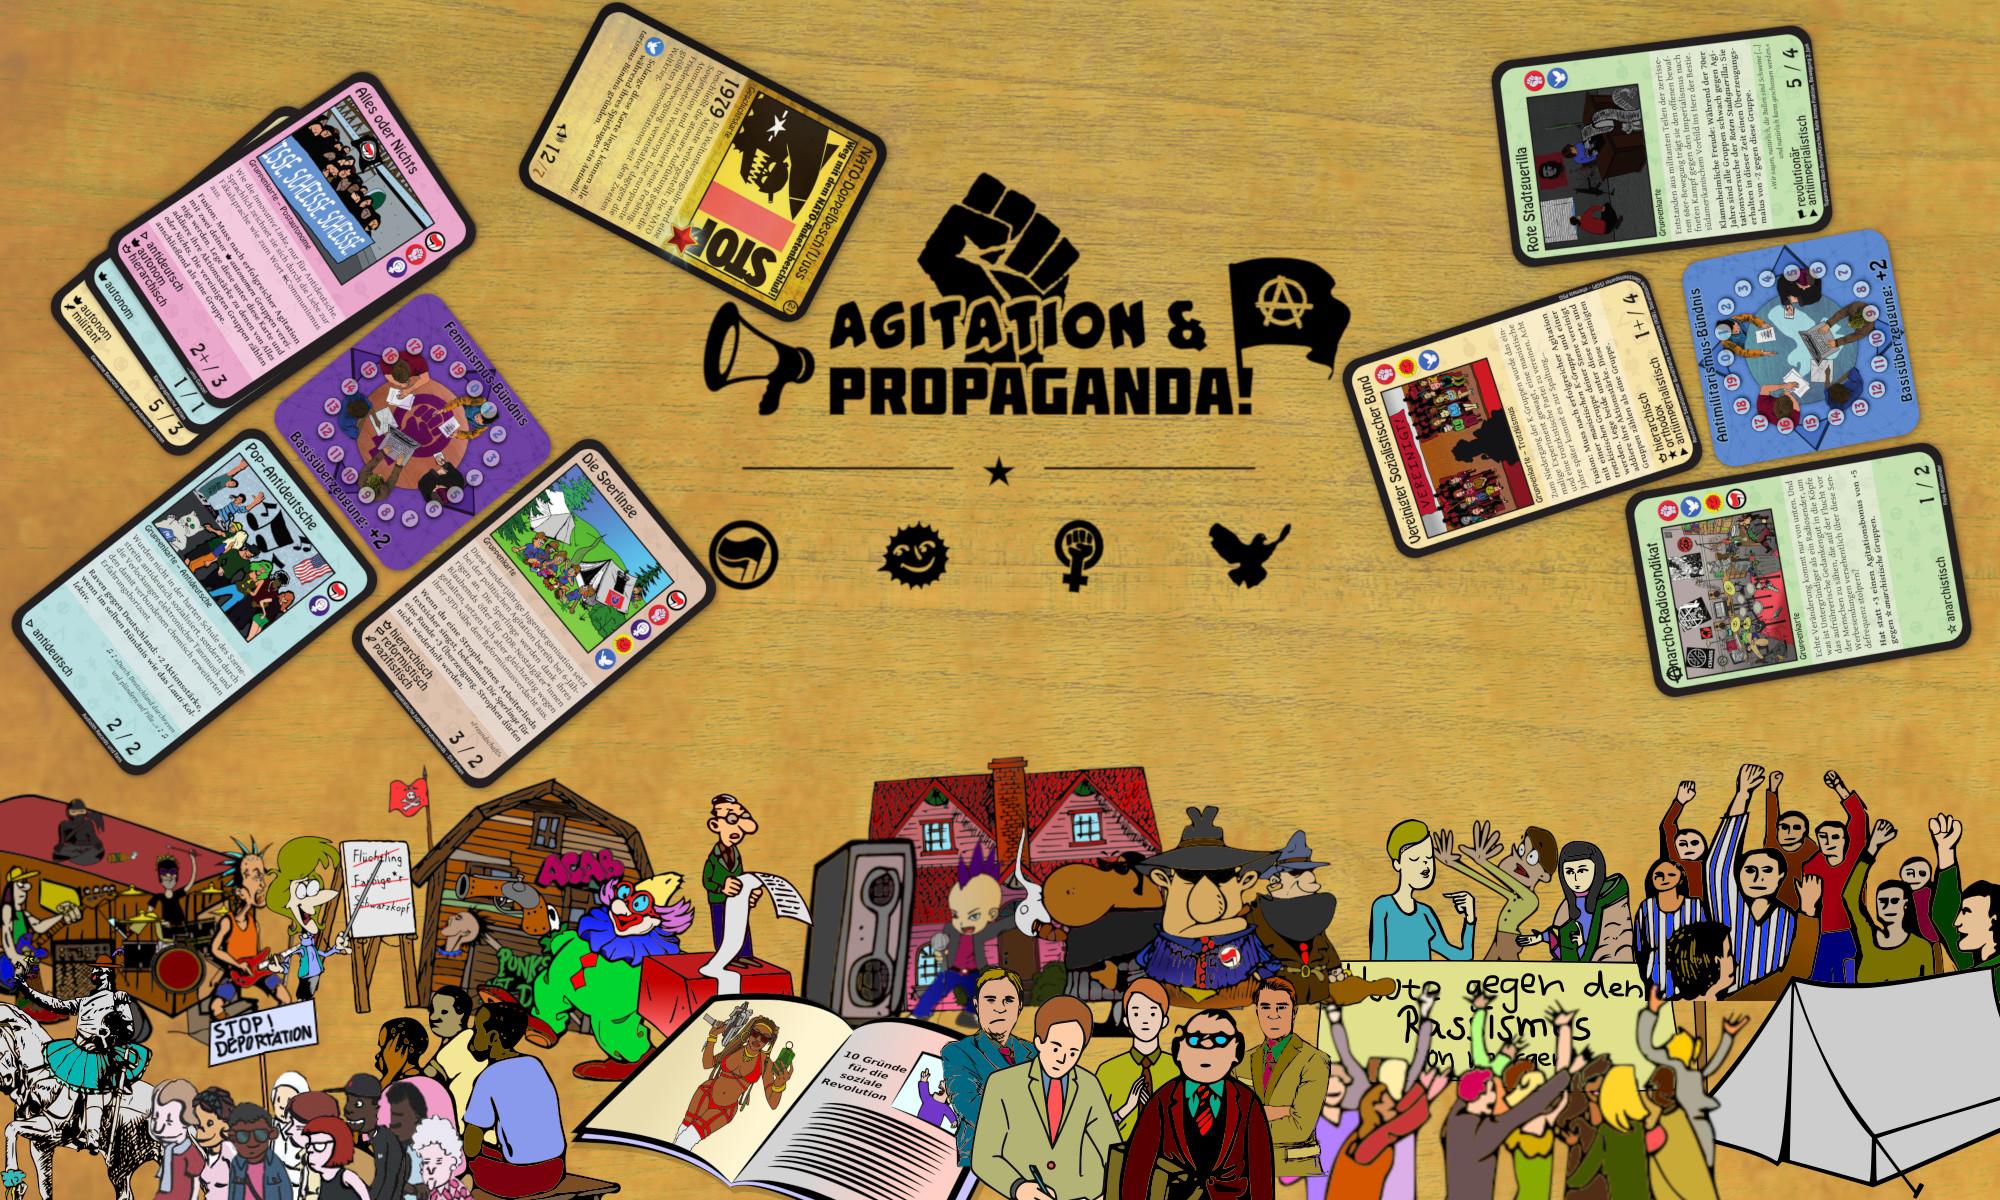 Agitation und Propaganda